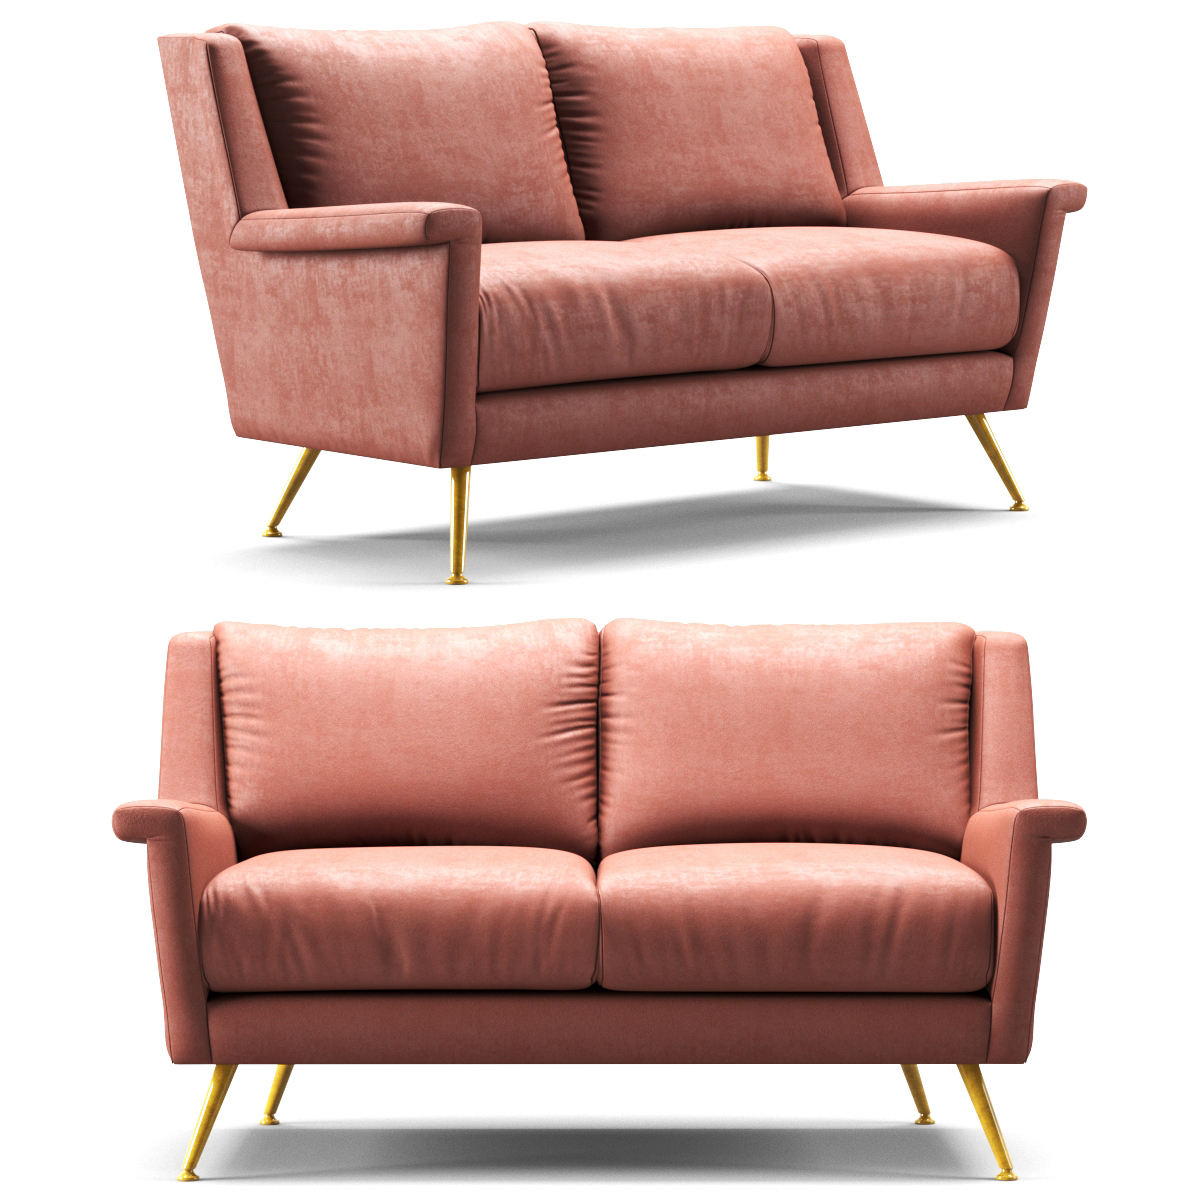 Full Size of Kare Sofa Dschinn Design Infinity Sale Proud Bed Samt Furniture List Couch Leder Gianni Sales Landhausstil Himolla Bunt Muuto Comfortmaster Polyrattan Landhaus Sofa Kare Sofa